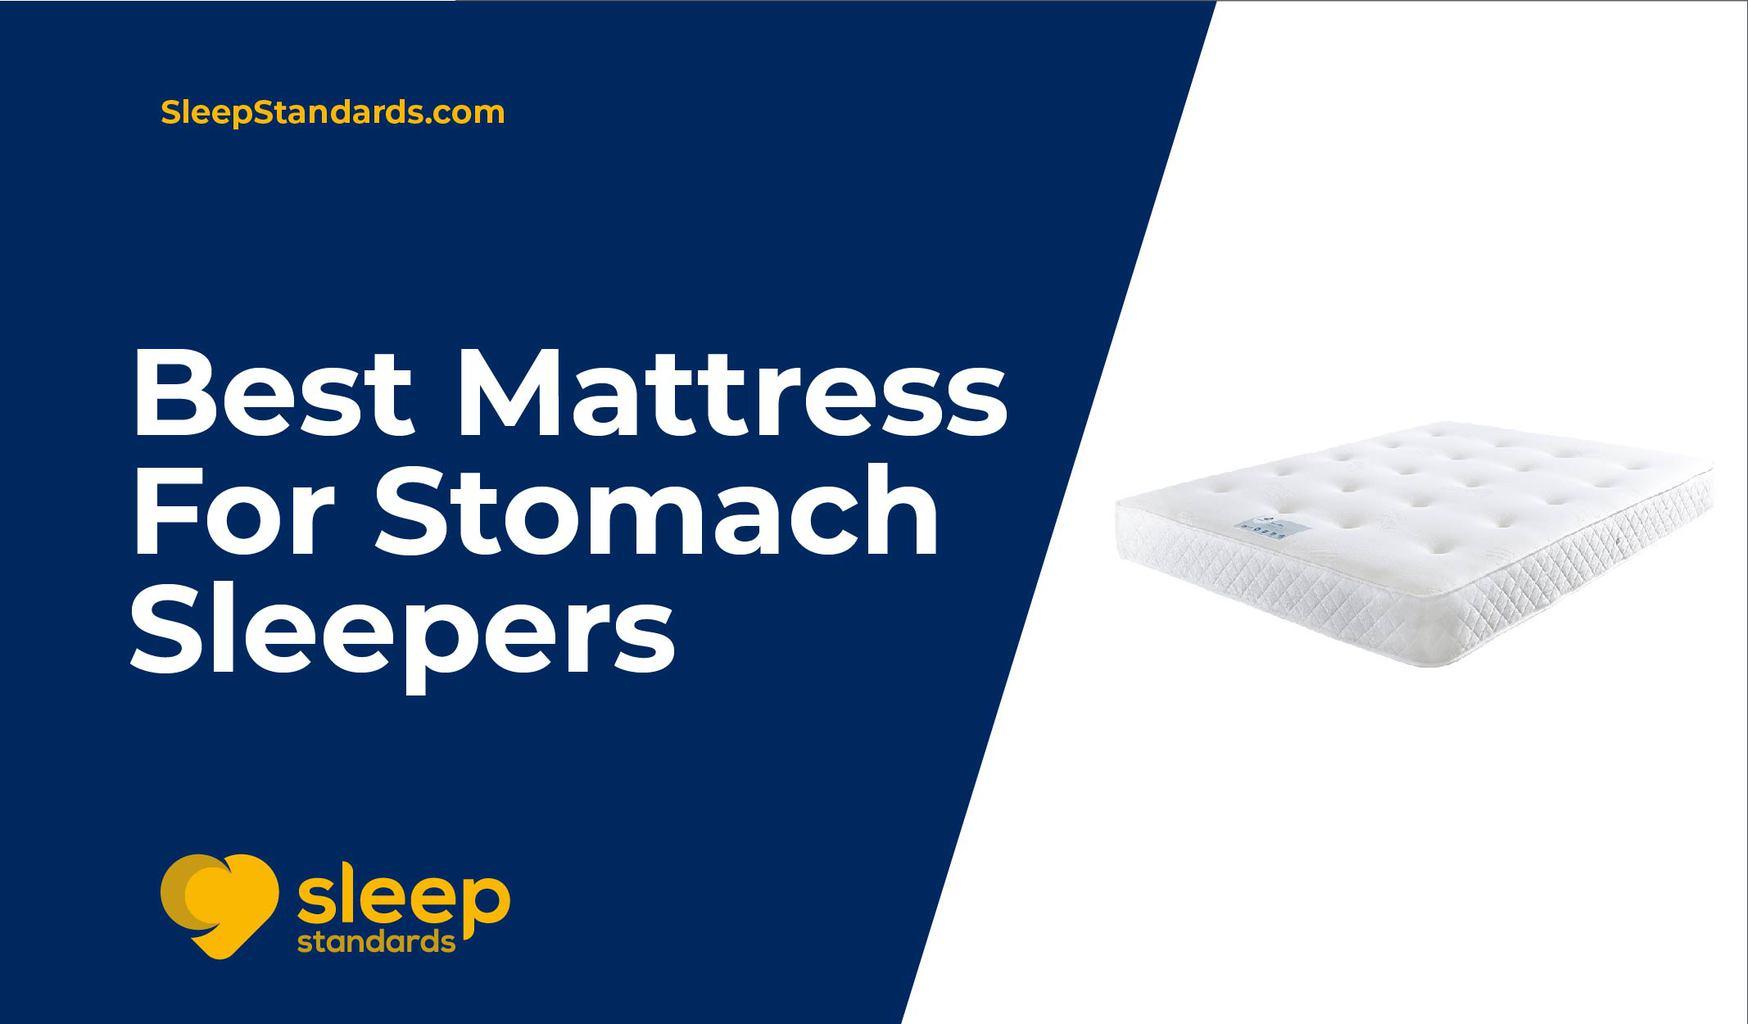 Best Mattress for Stomach Sleepers